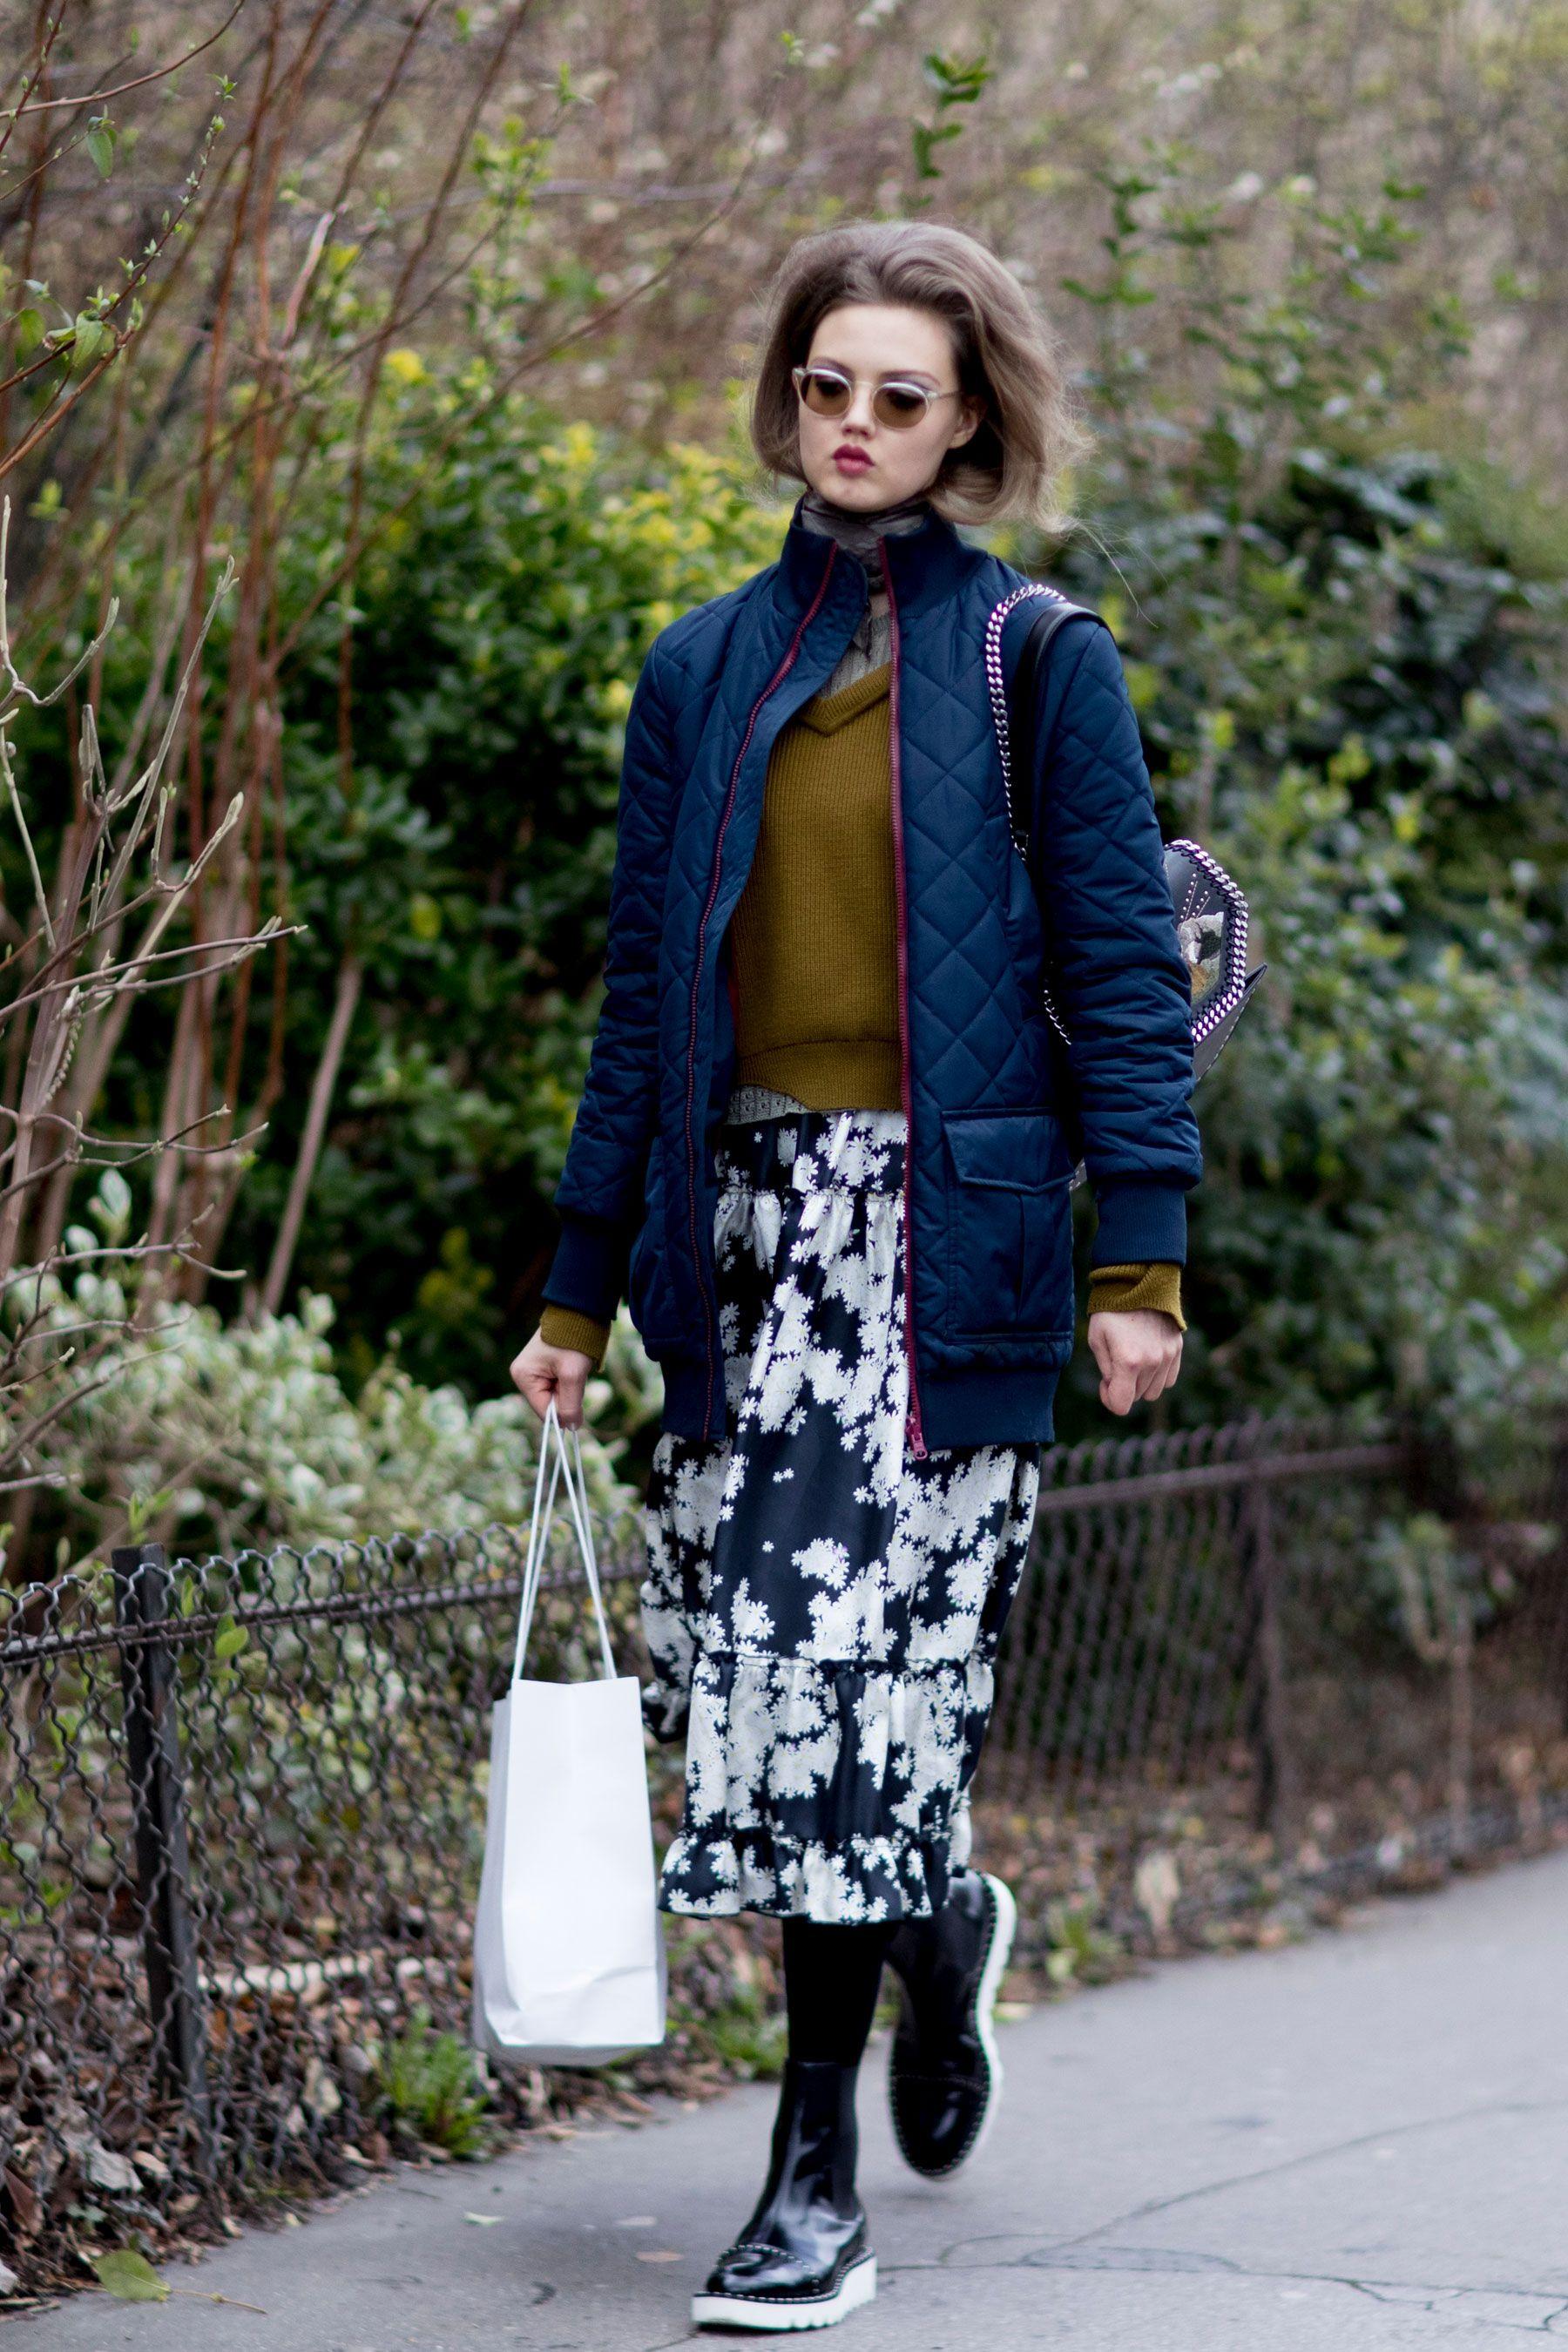 Paris Fashion Week Autumn Winter 2017 Models Off Duty